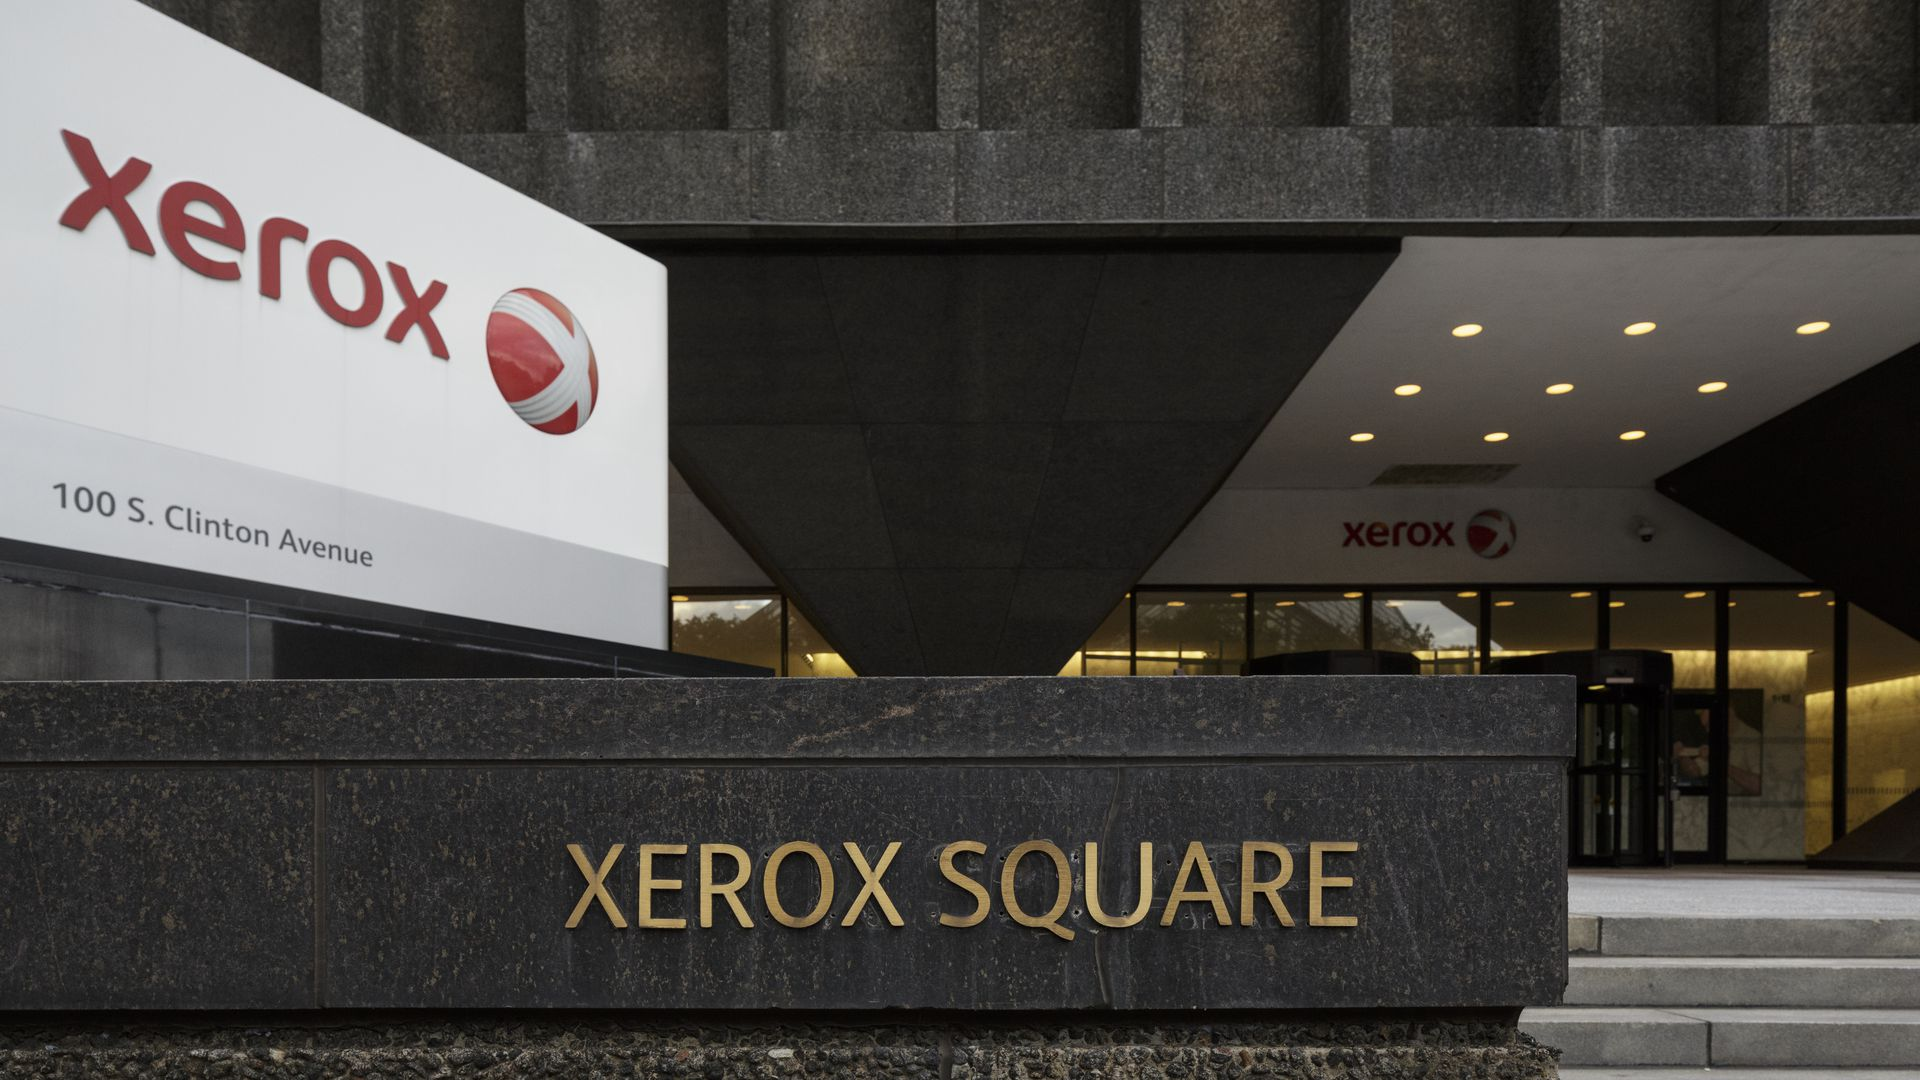 Xerox building